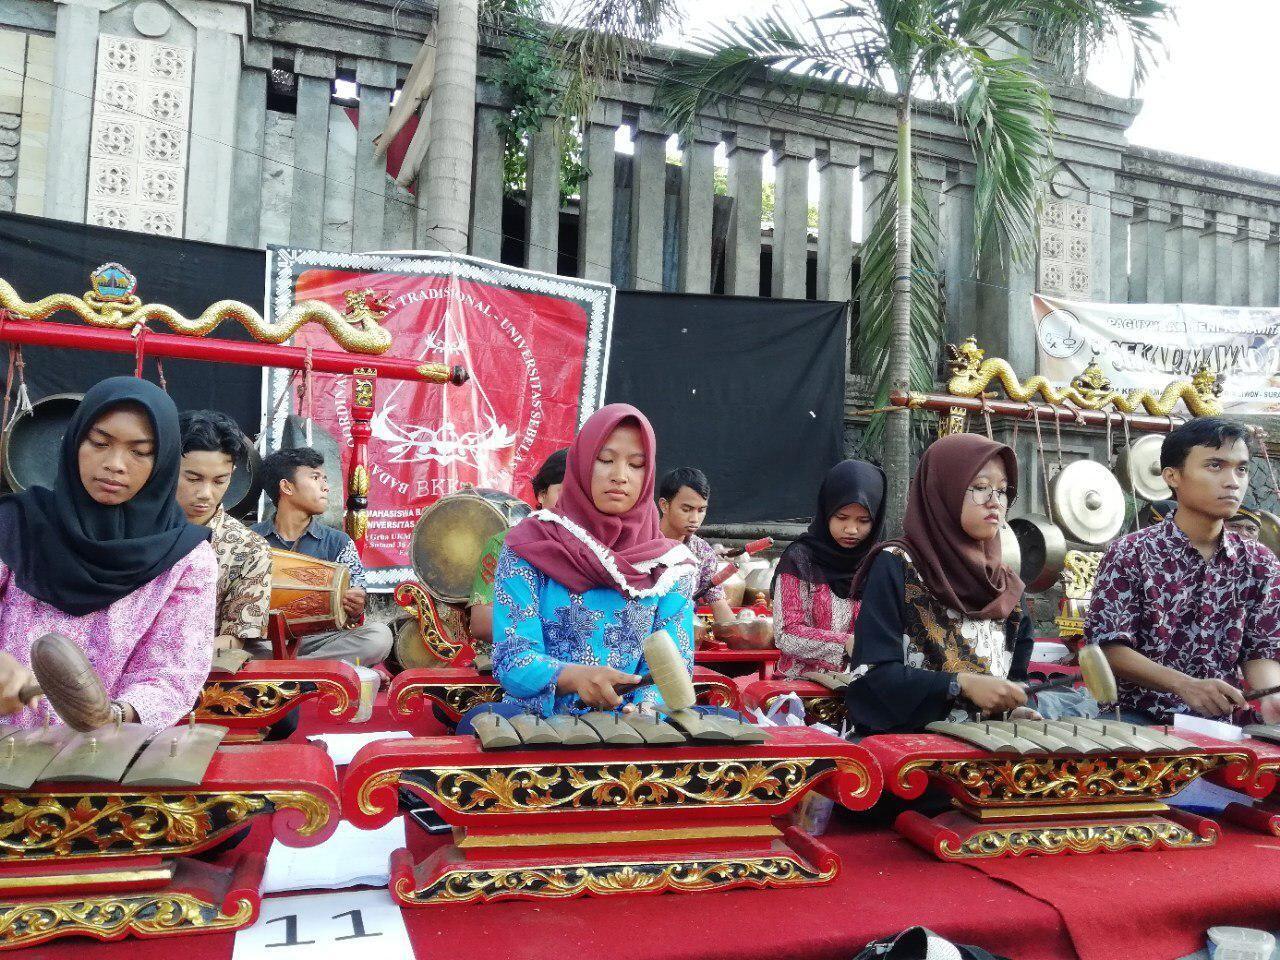 Anak Muda Solo Antusias Sambut International Gamelan Festival 2018